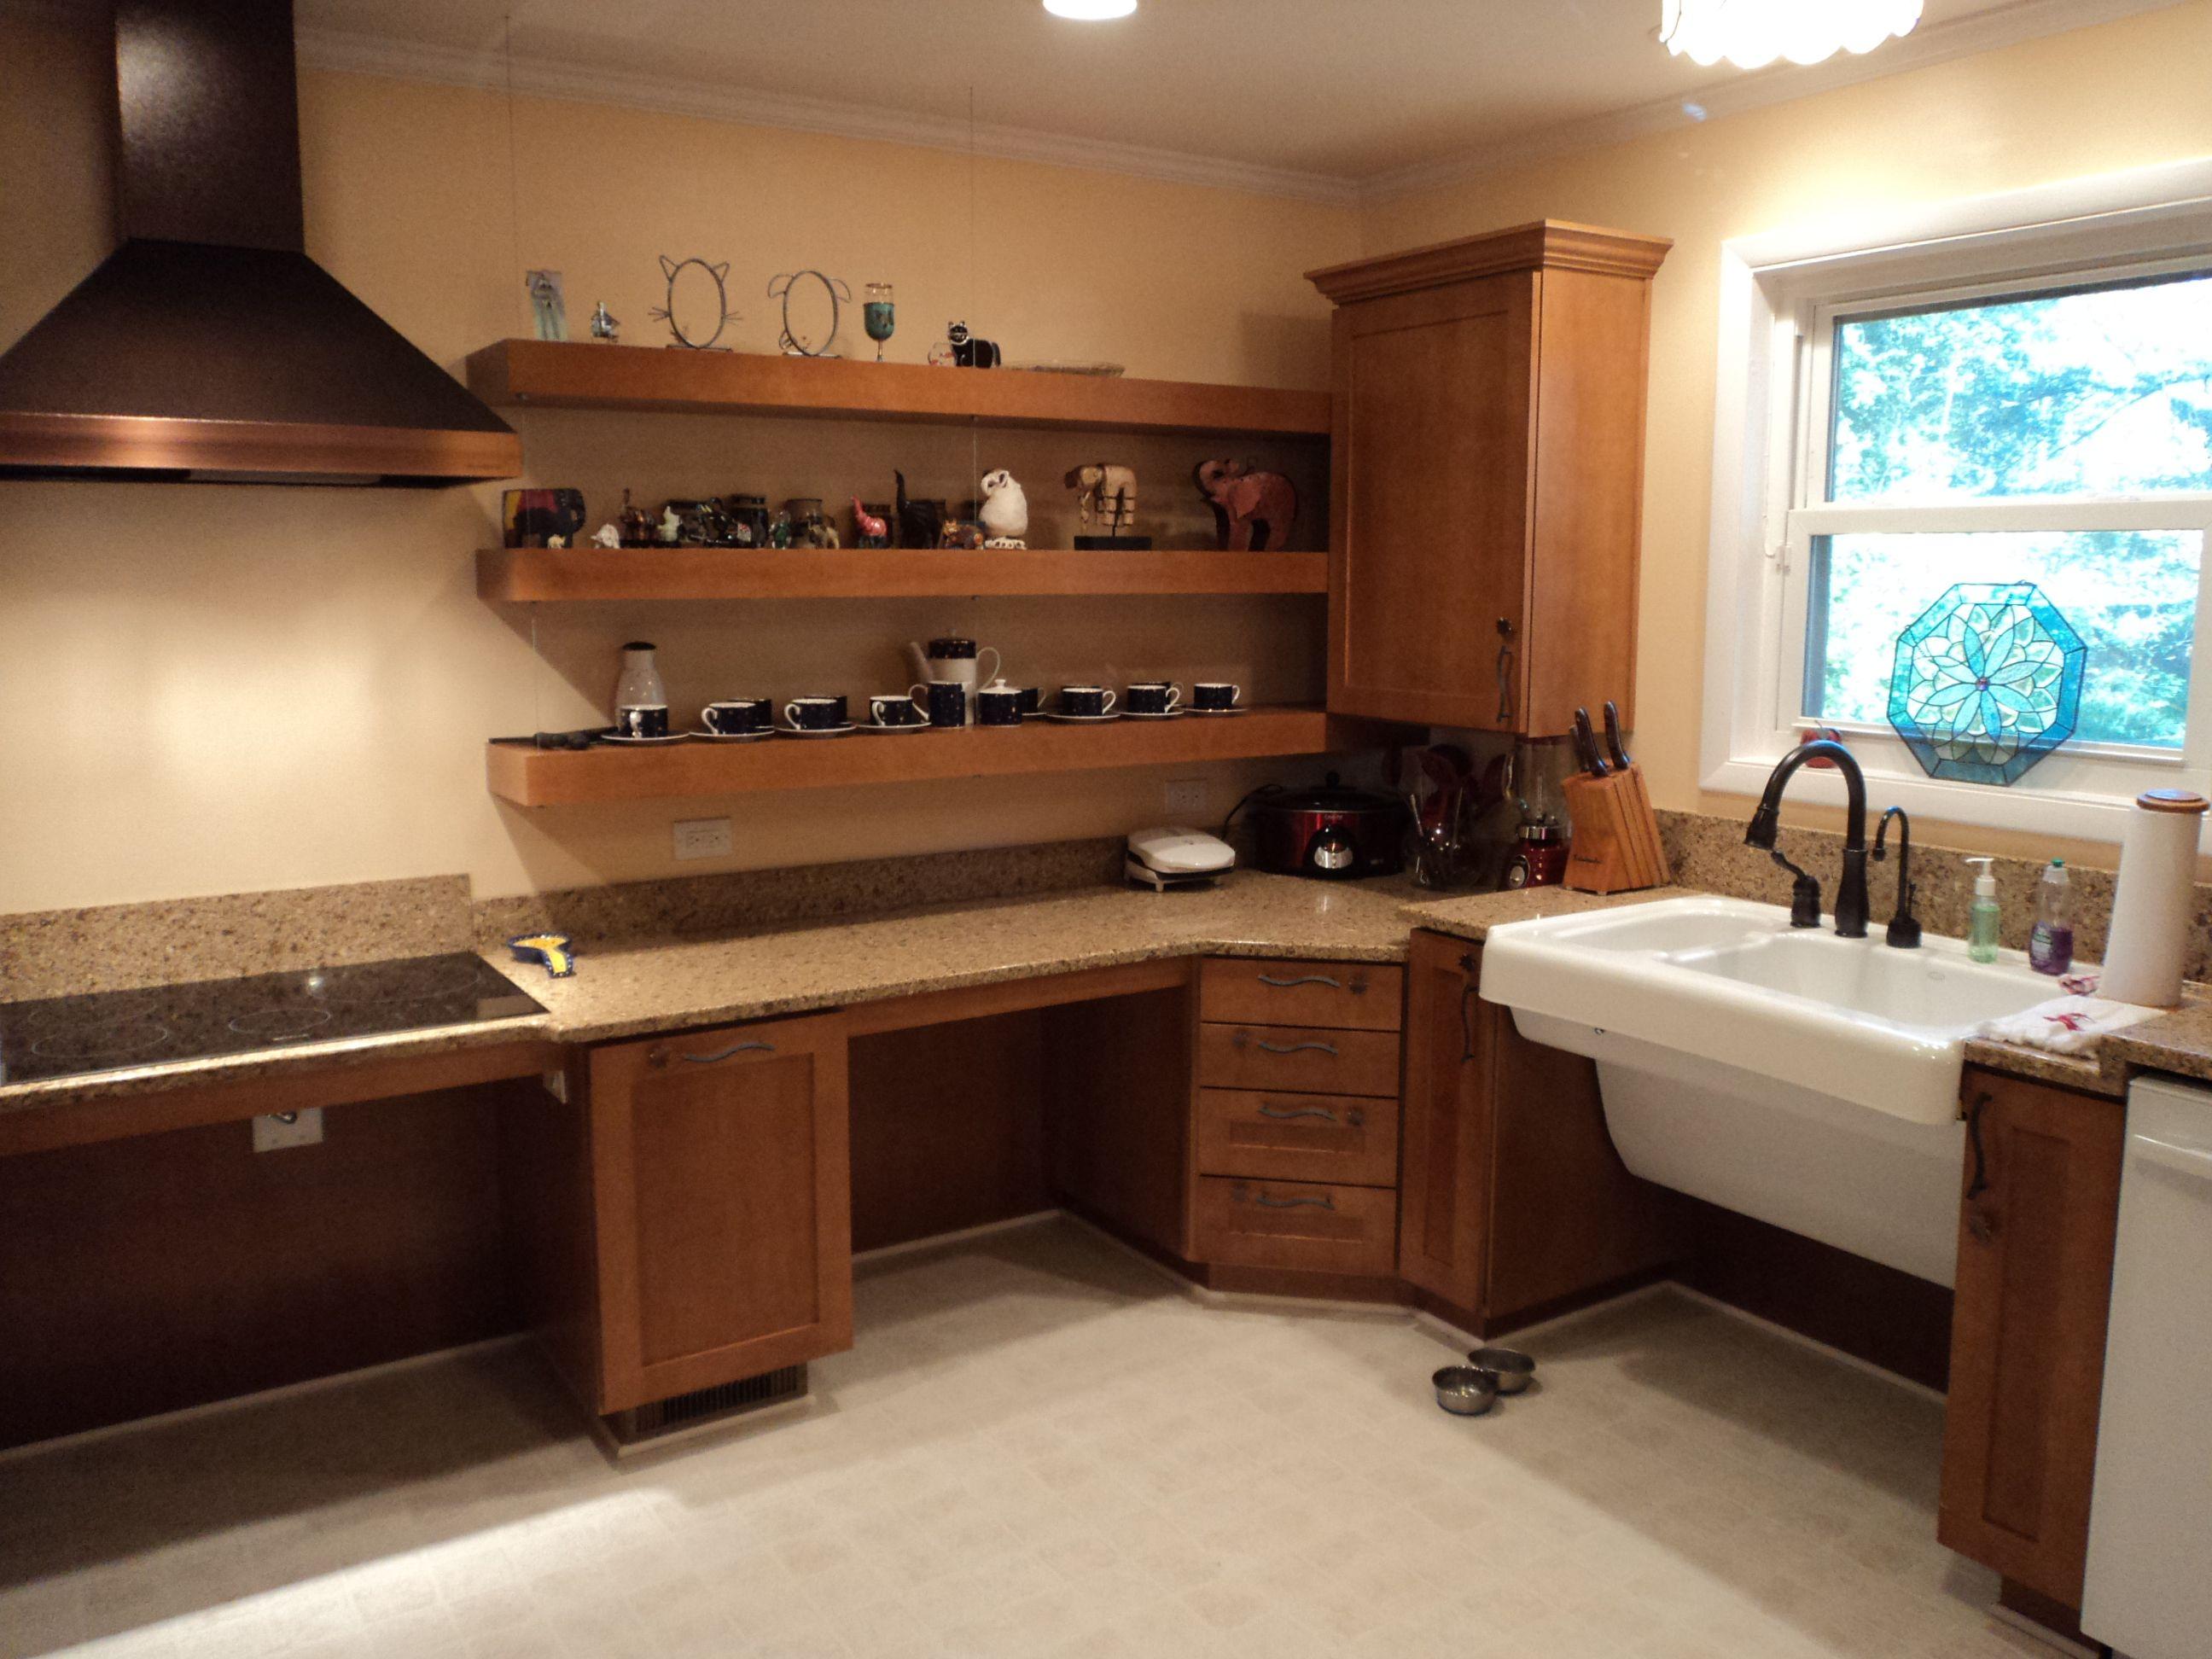 Open Space Under Counters Wheelchair Reachable Wall Storage Kitchen Design Kitchen Innovation Kitchen Table Makeover